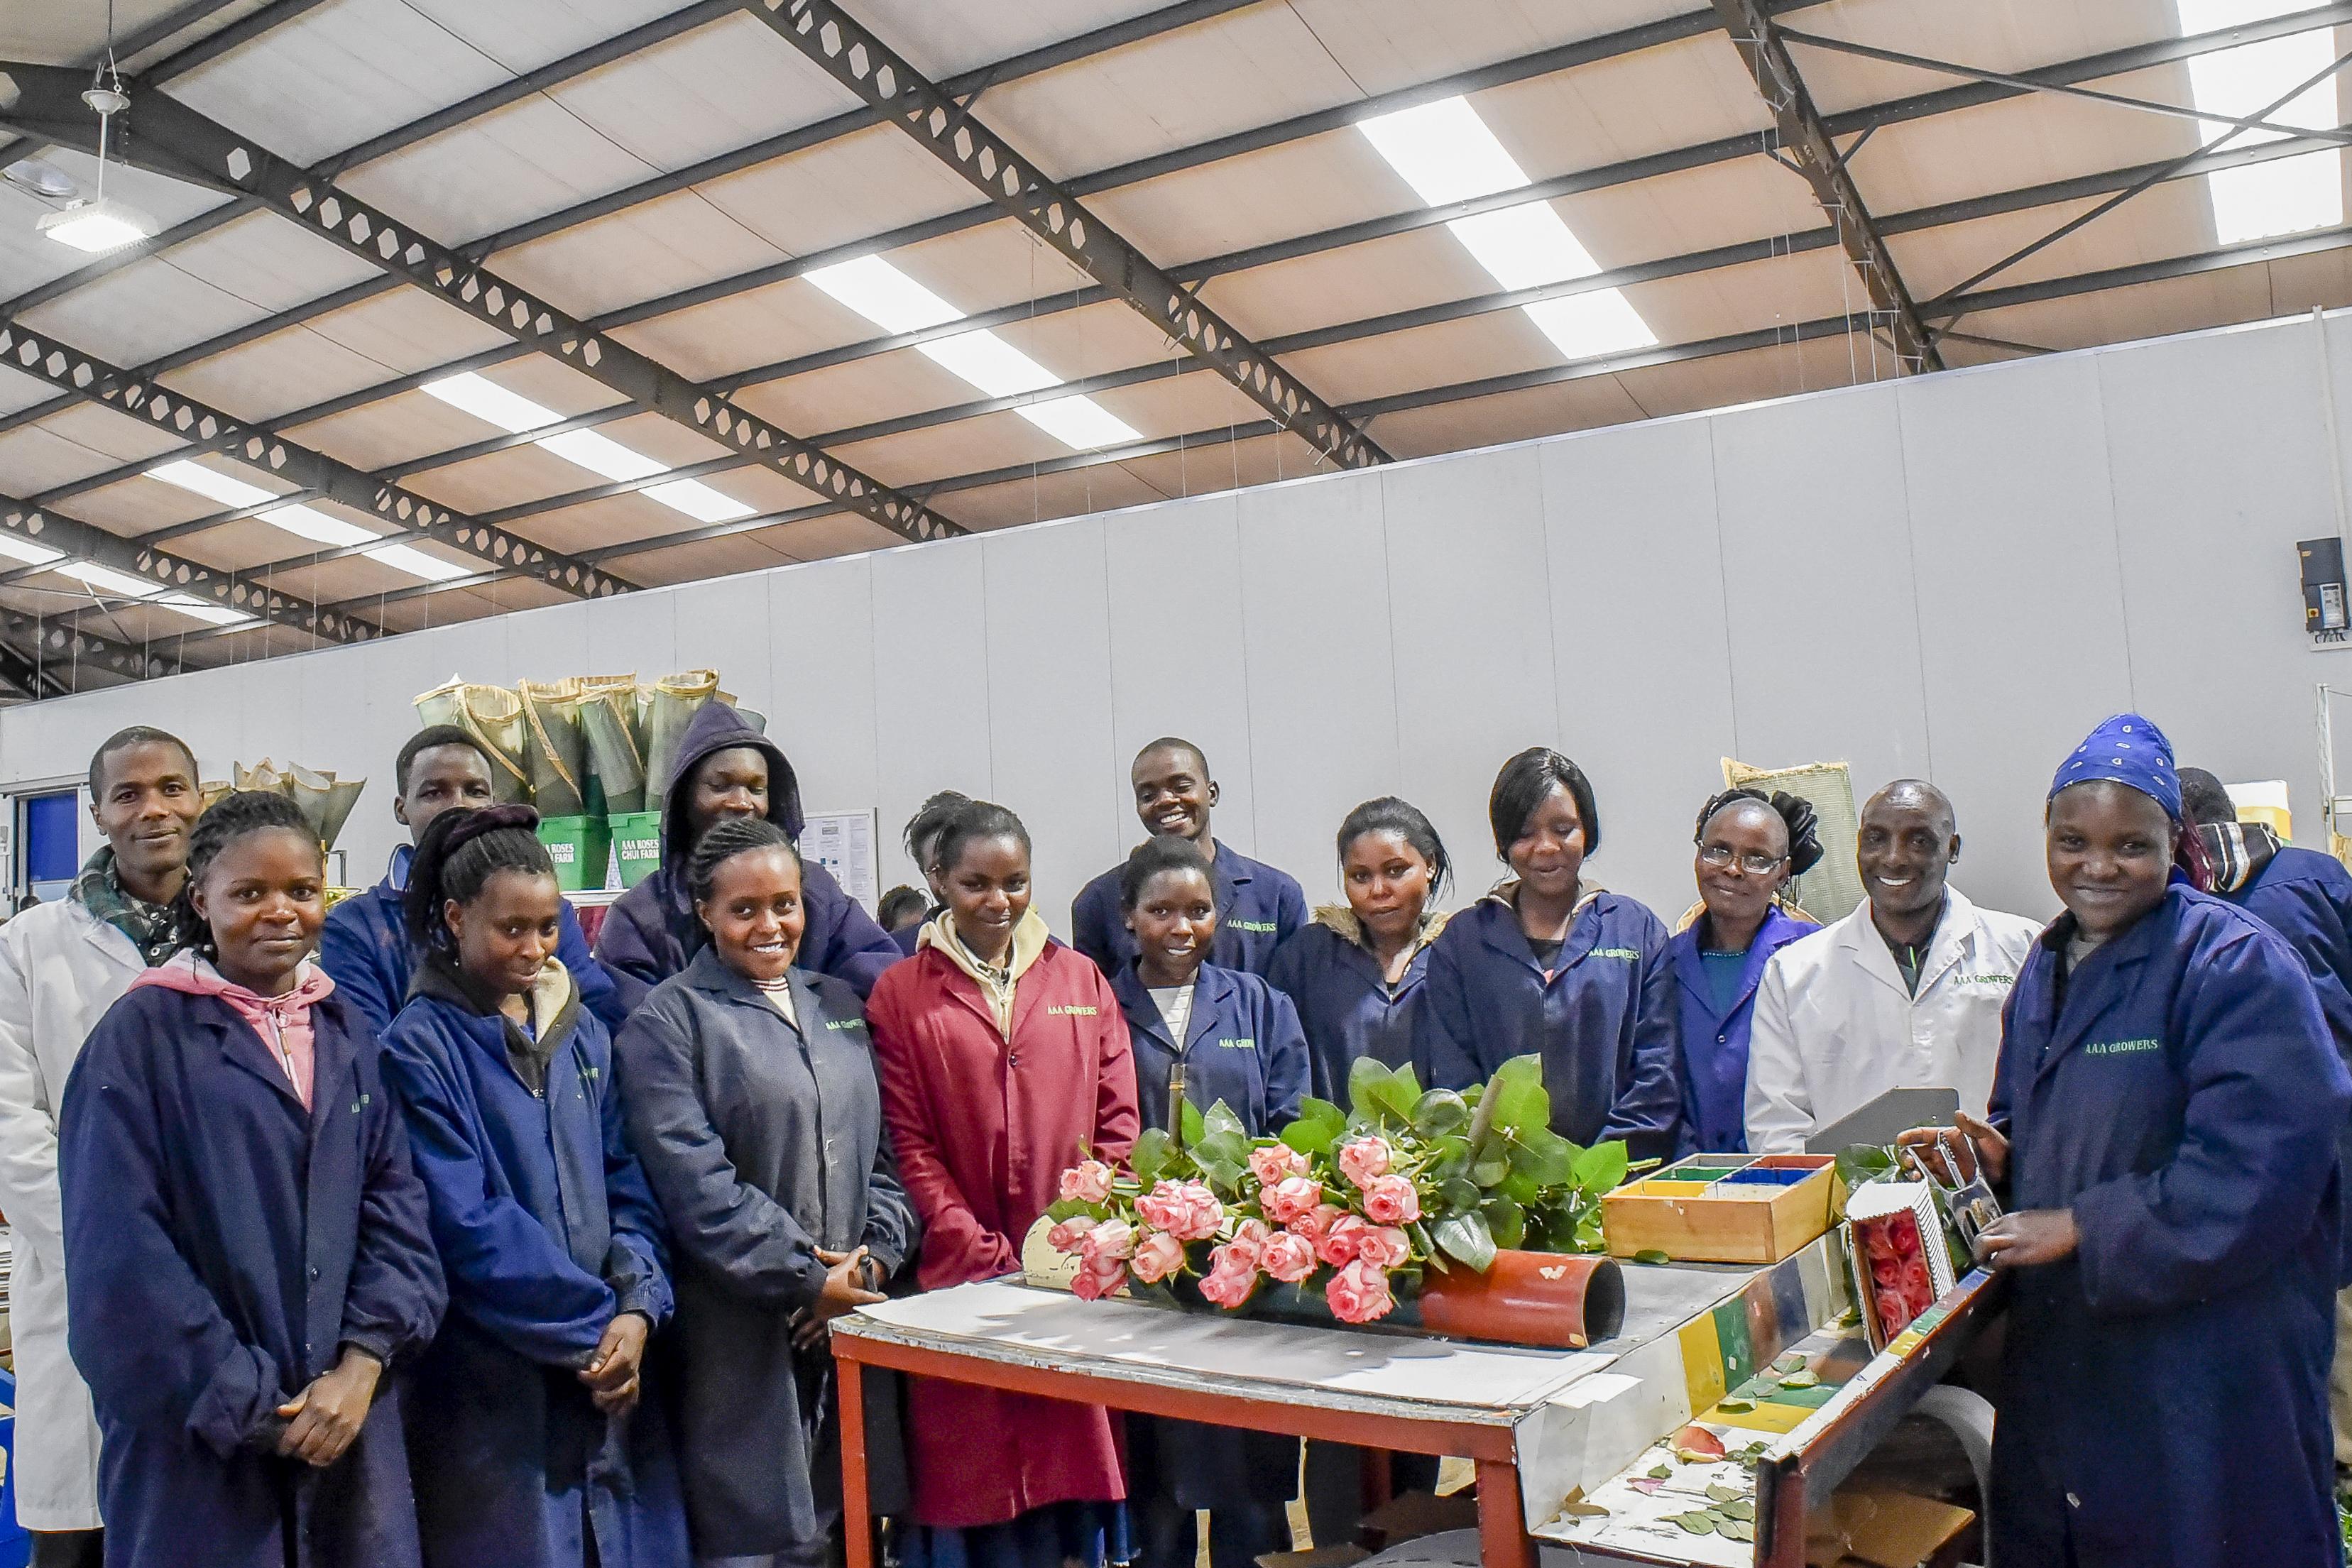 Staff of Bellissima roses